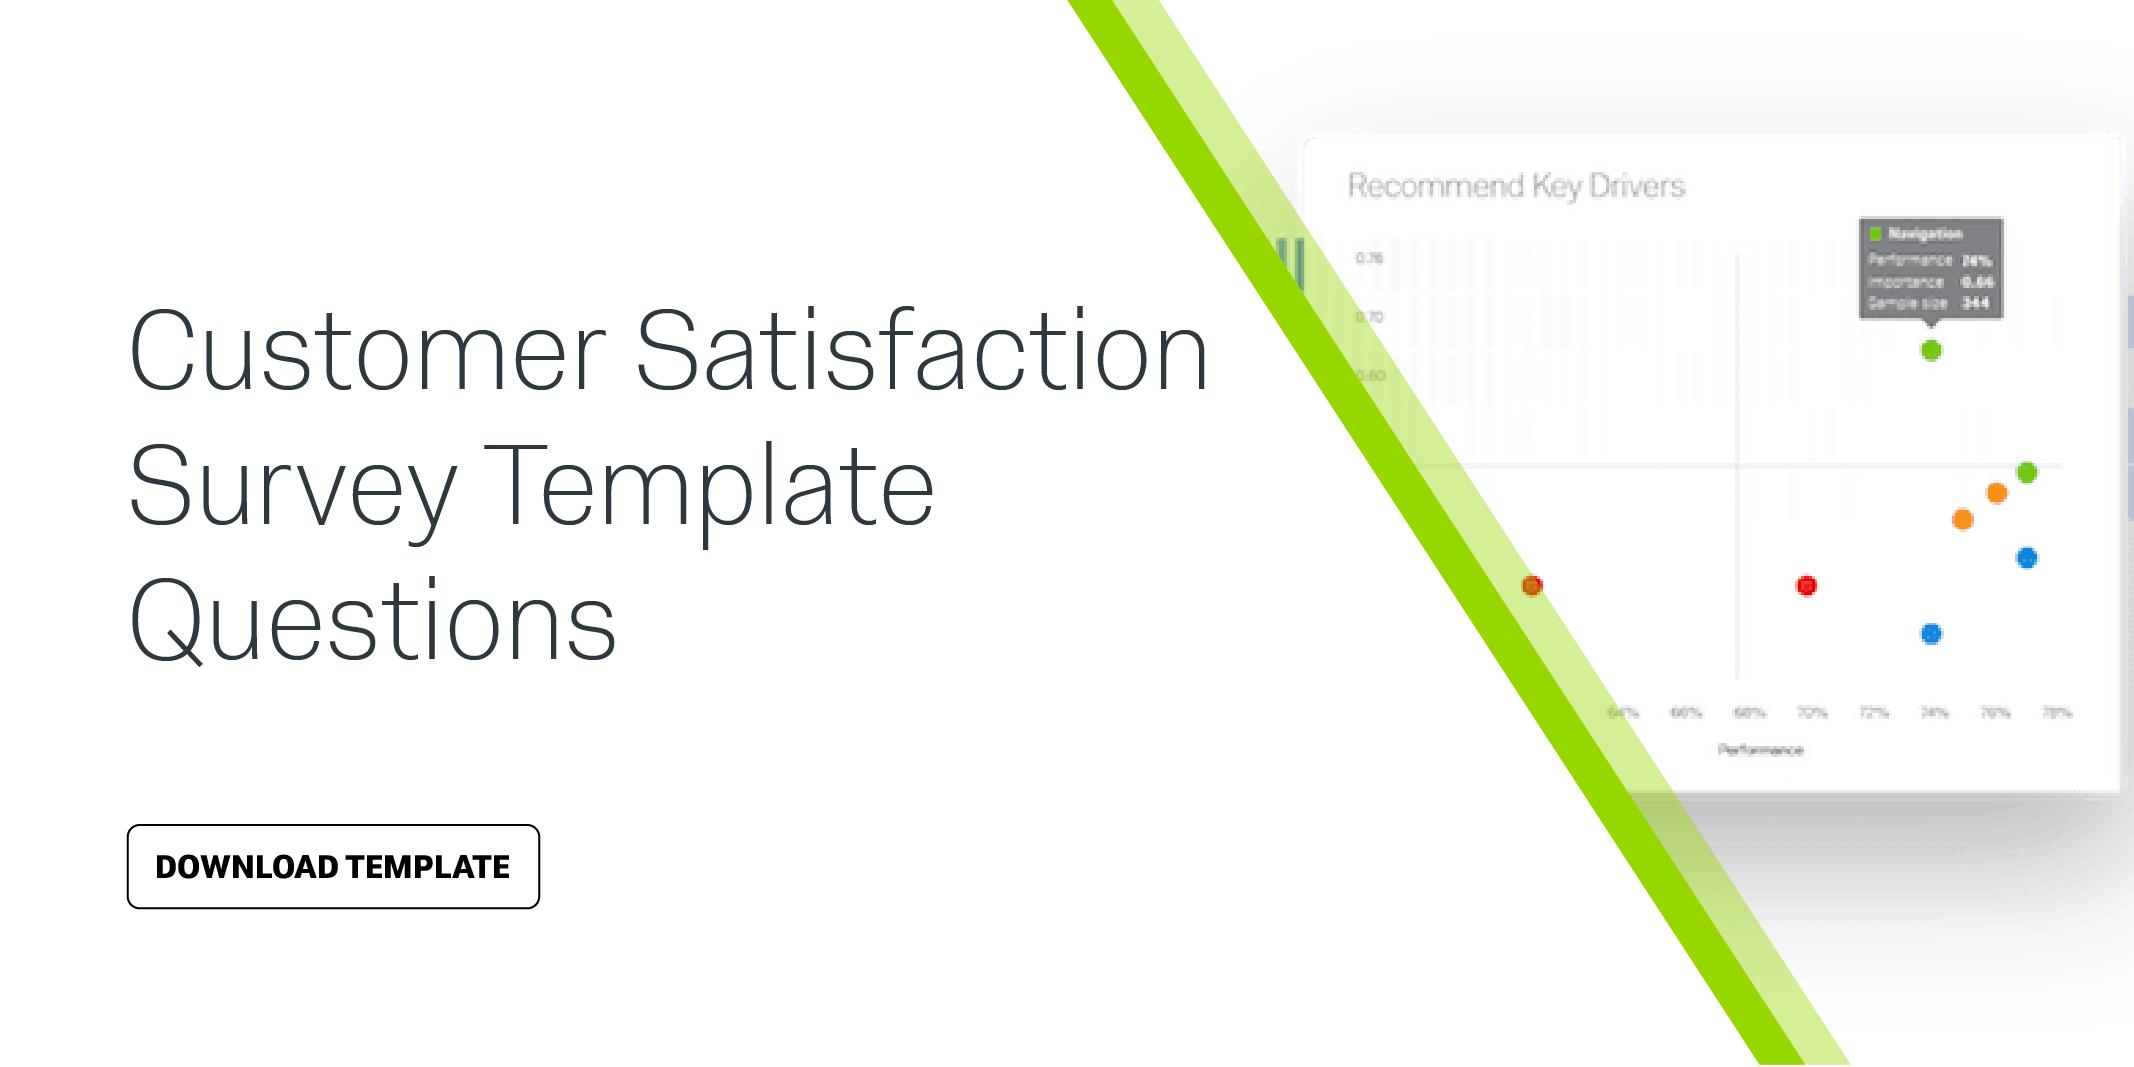 Customer Satisfaction Survey Template Questions  Qualtrics In Customer Satisfaction Report Template